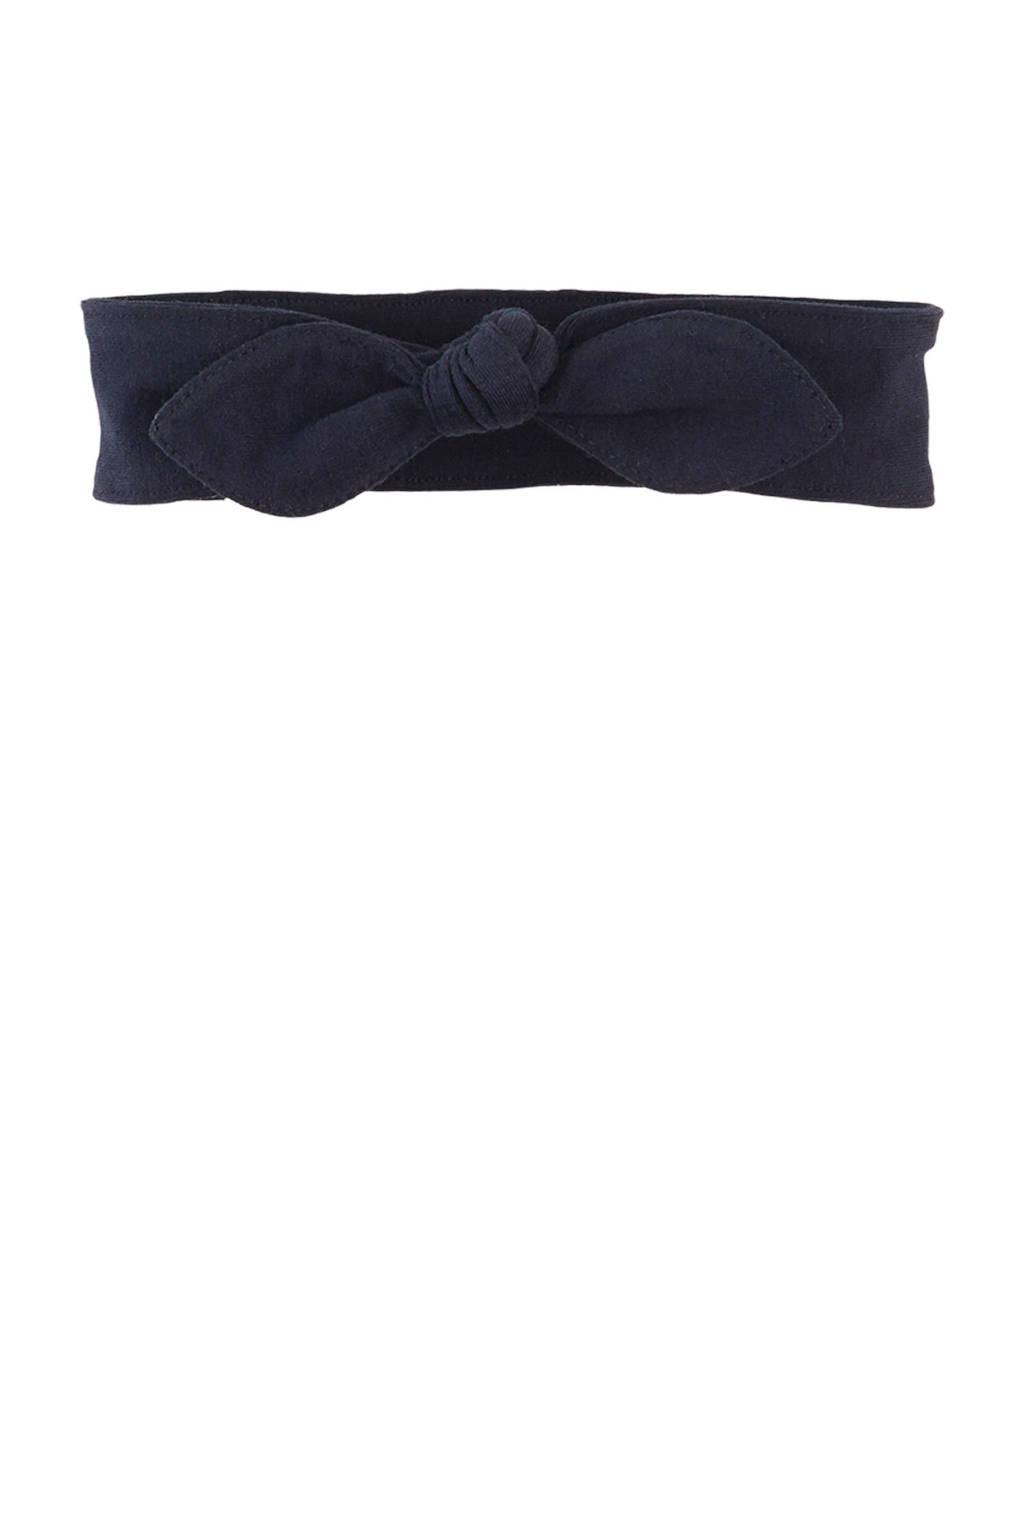 Z8 newborn haarband Doortje donkerblauw, Donkerblauw